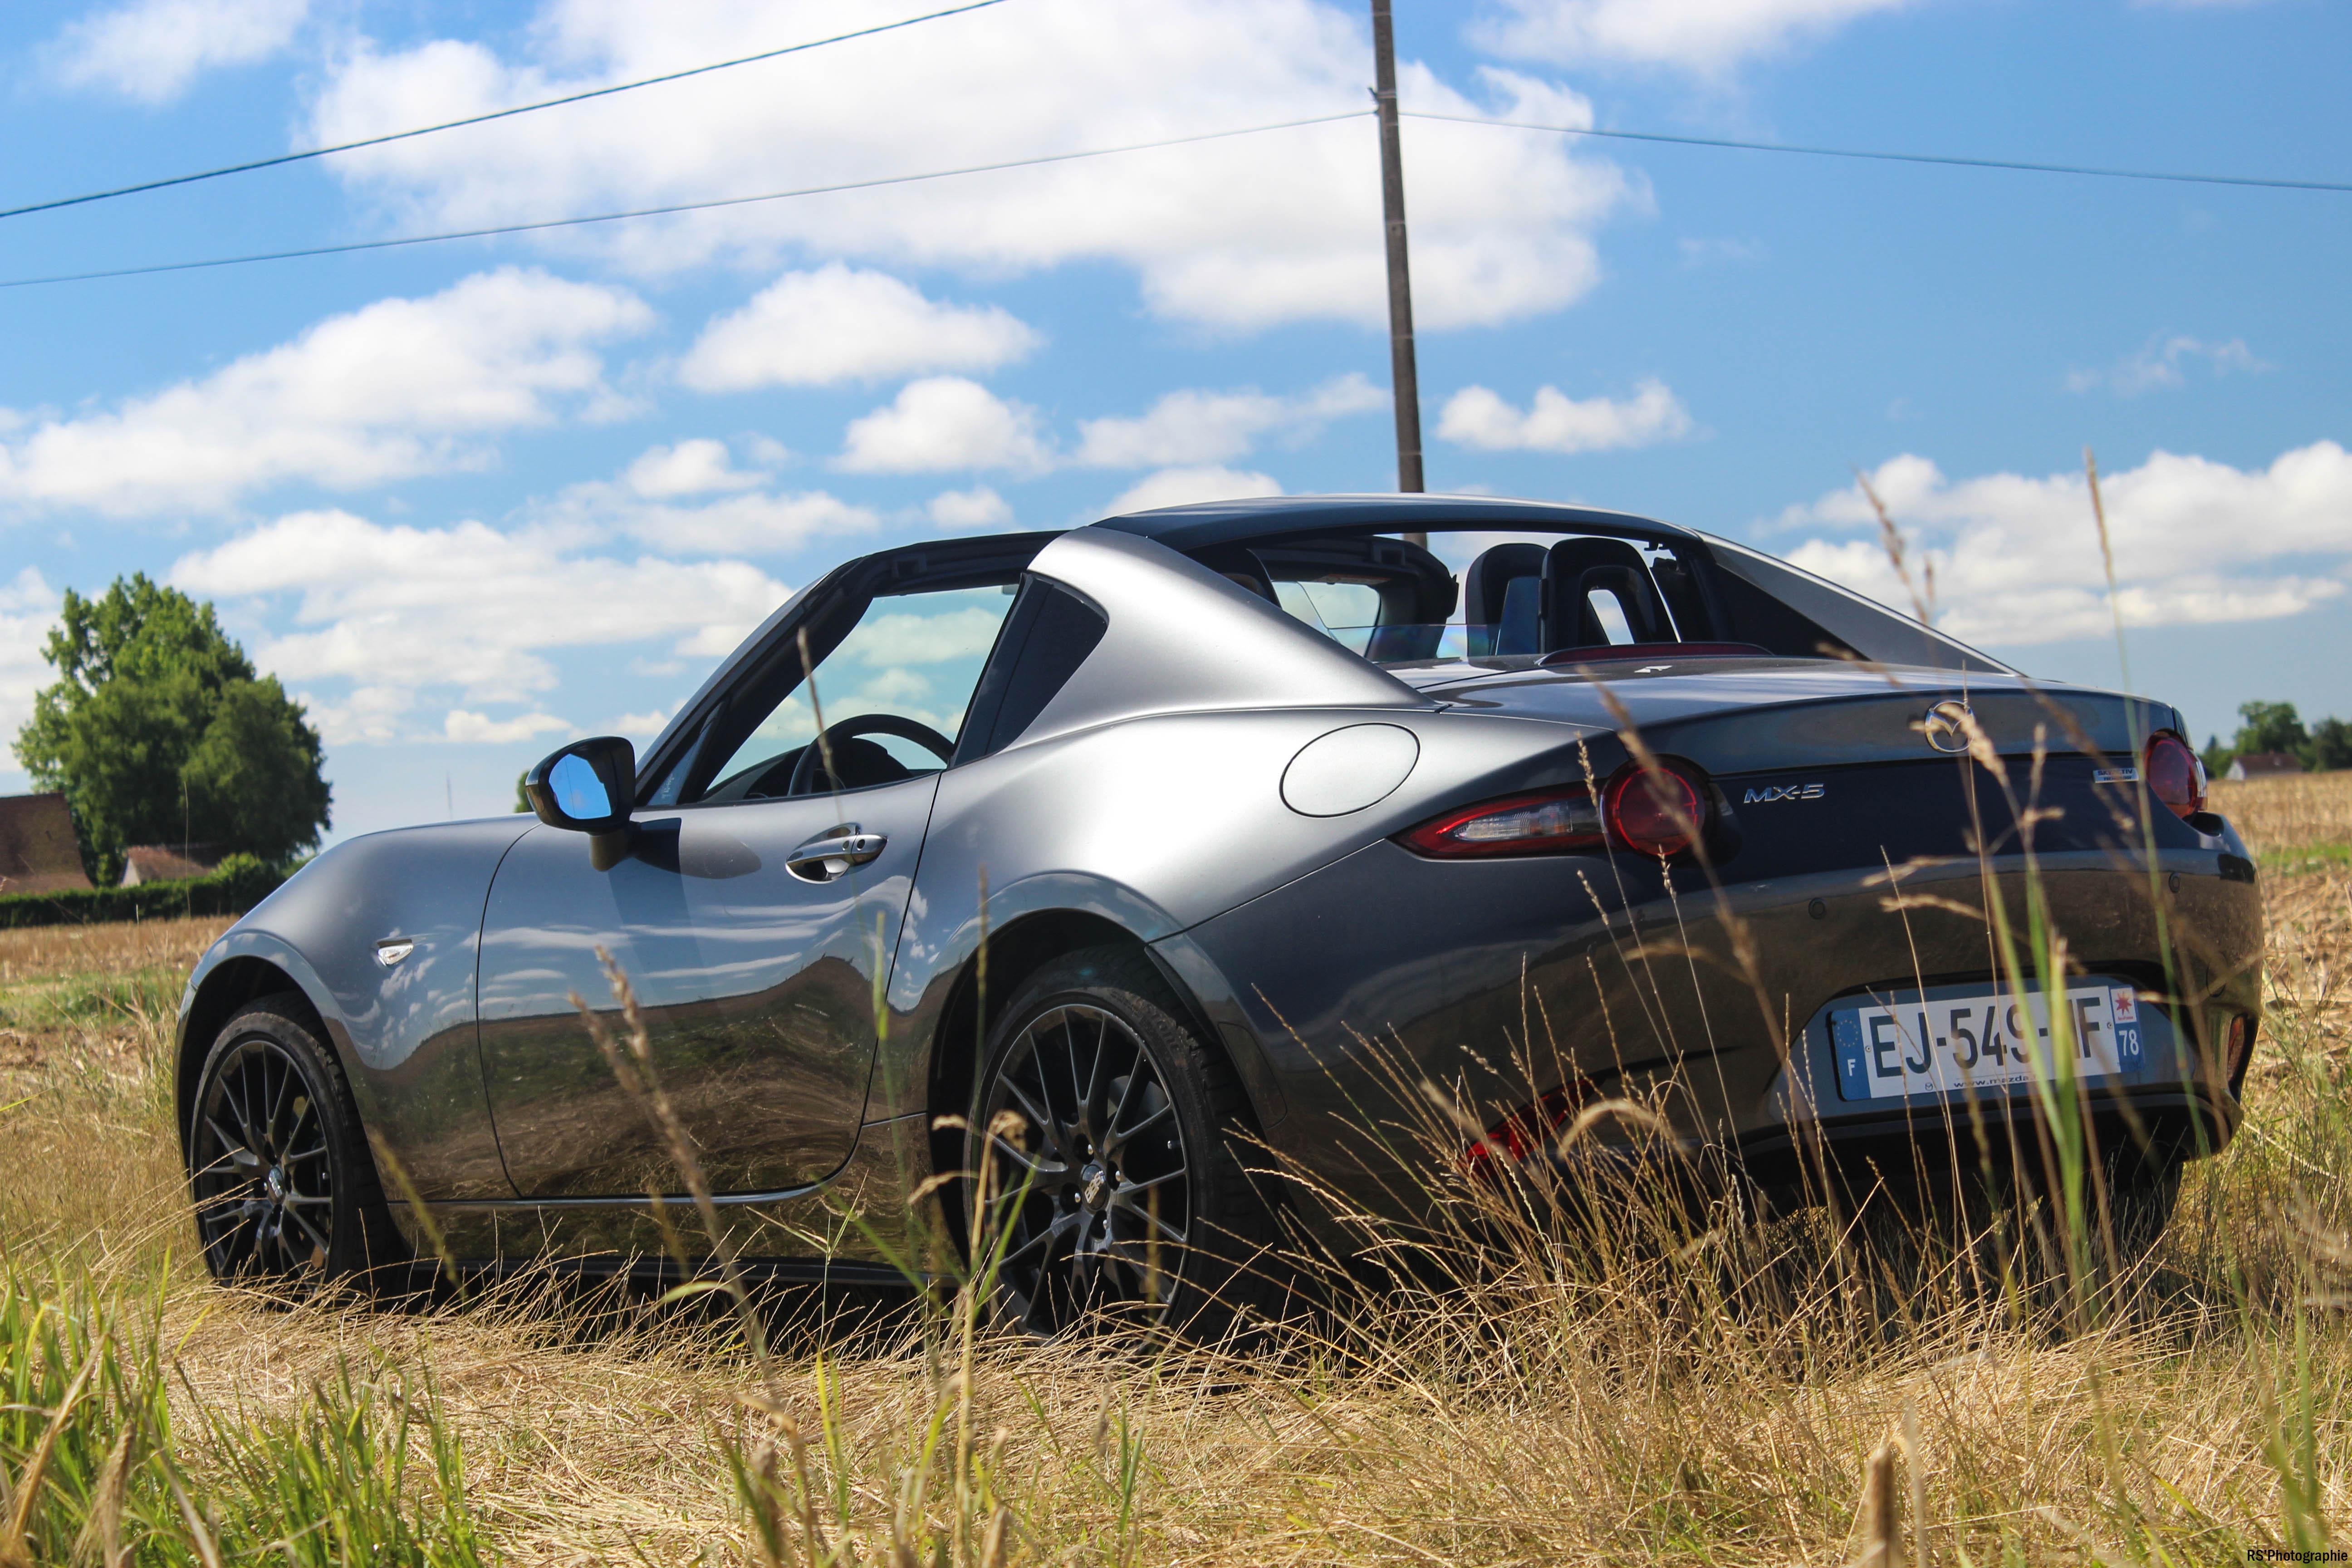 MazdaMX5RF60-mazda-mx5-rf-edition-arriere-rear-Arnaud Demasier-RSPhotographie